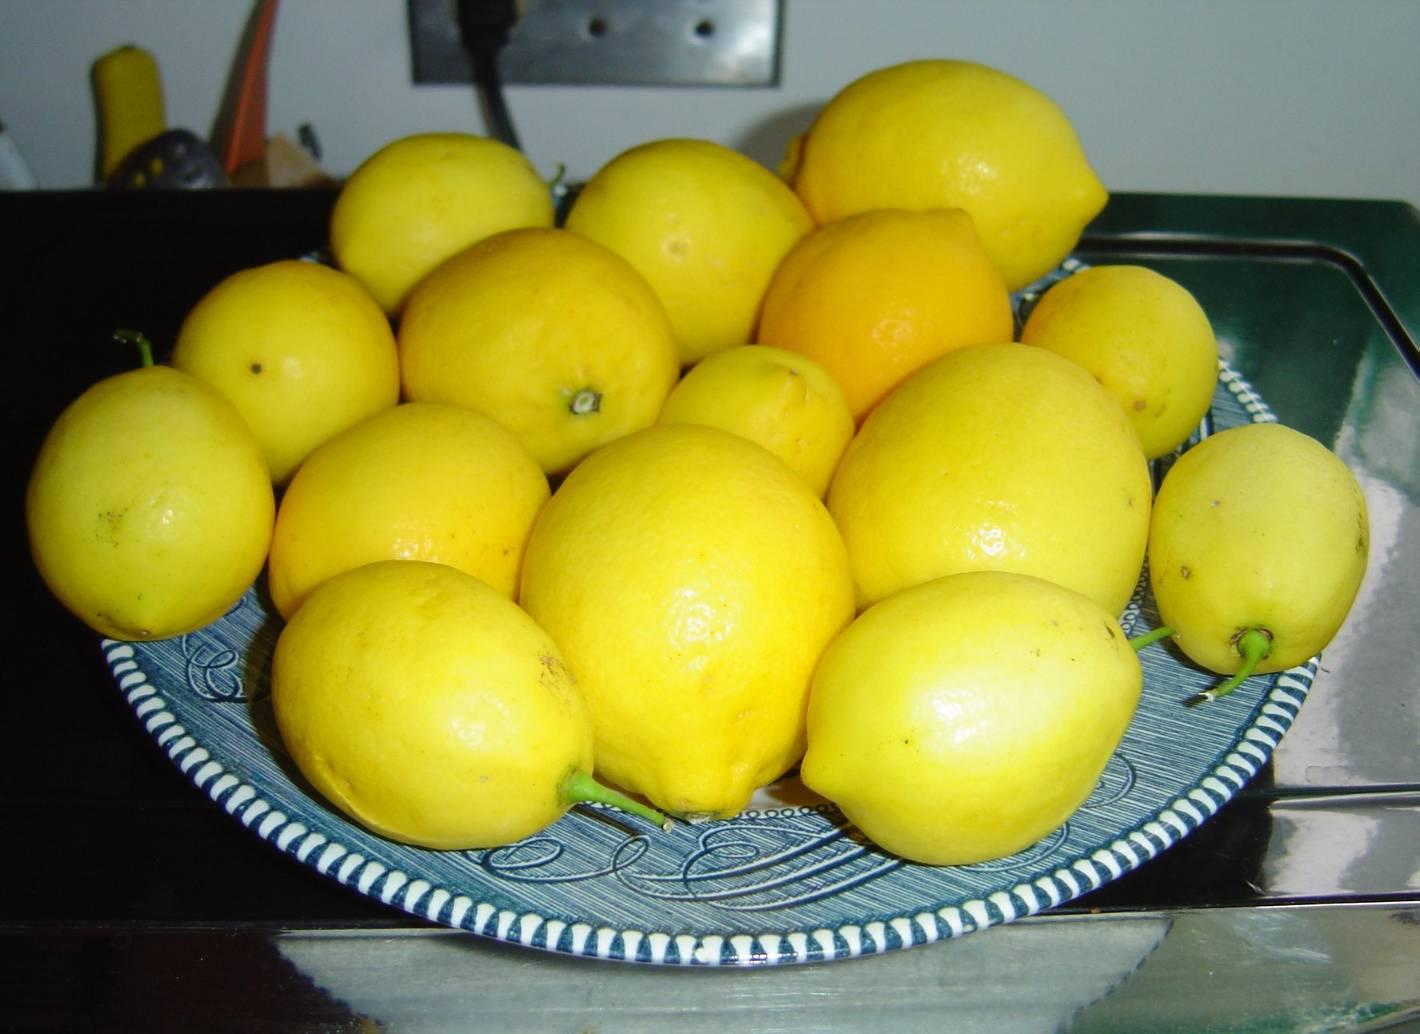 Lemons for My Lemon Sweet Buns With Lemon-Sugar Coating